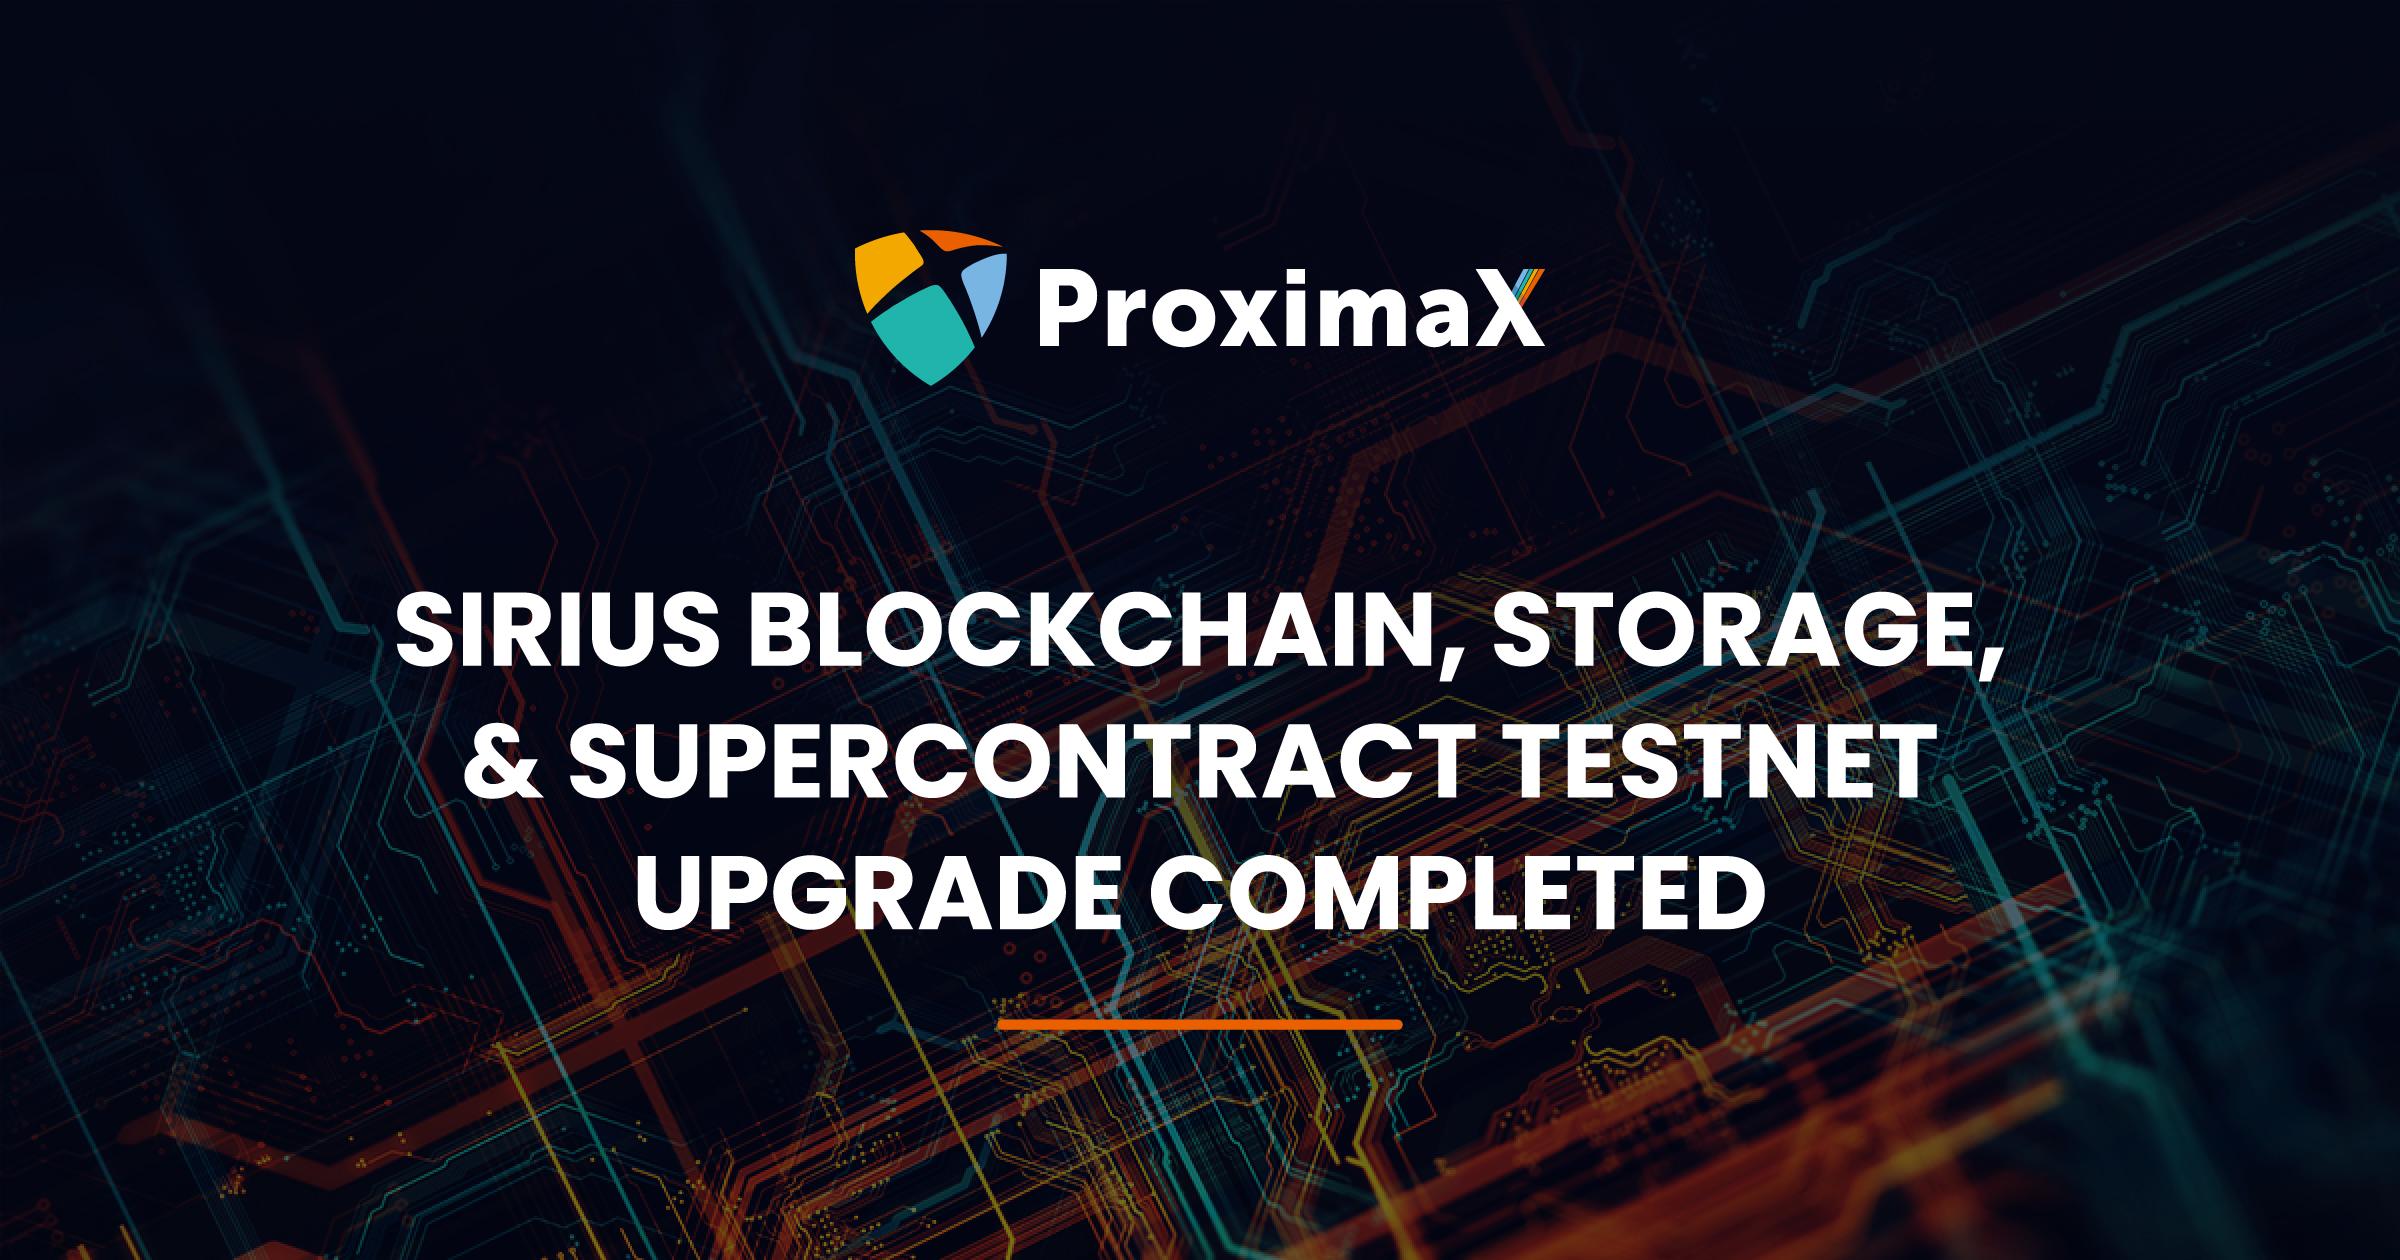 ProximaX Sirius Public Platform – Test Network Upgrade